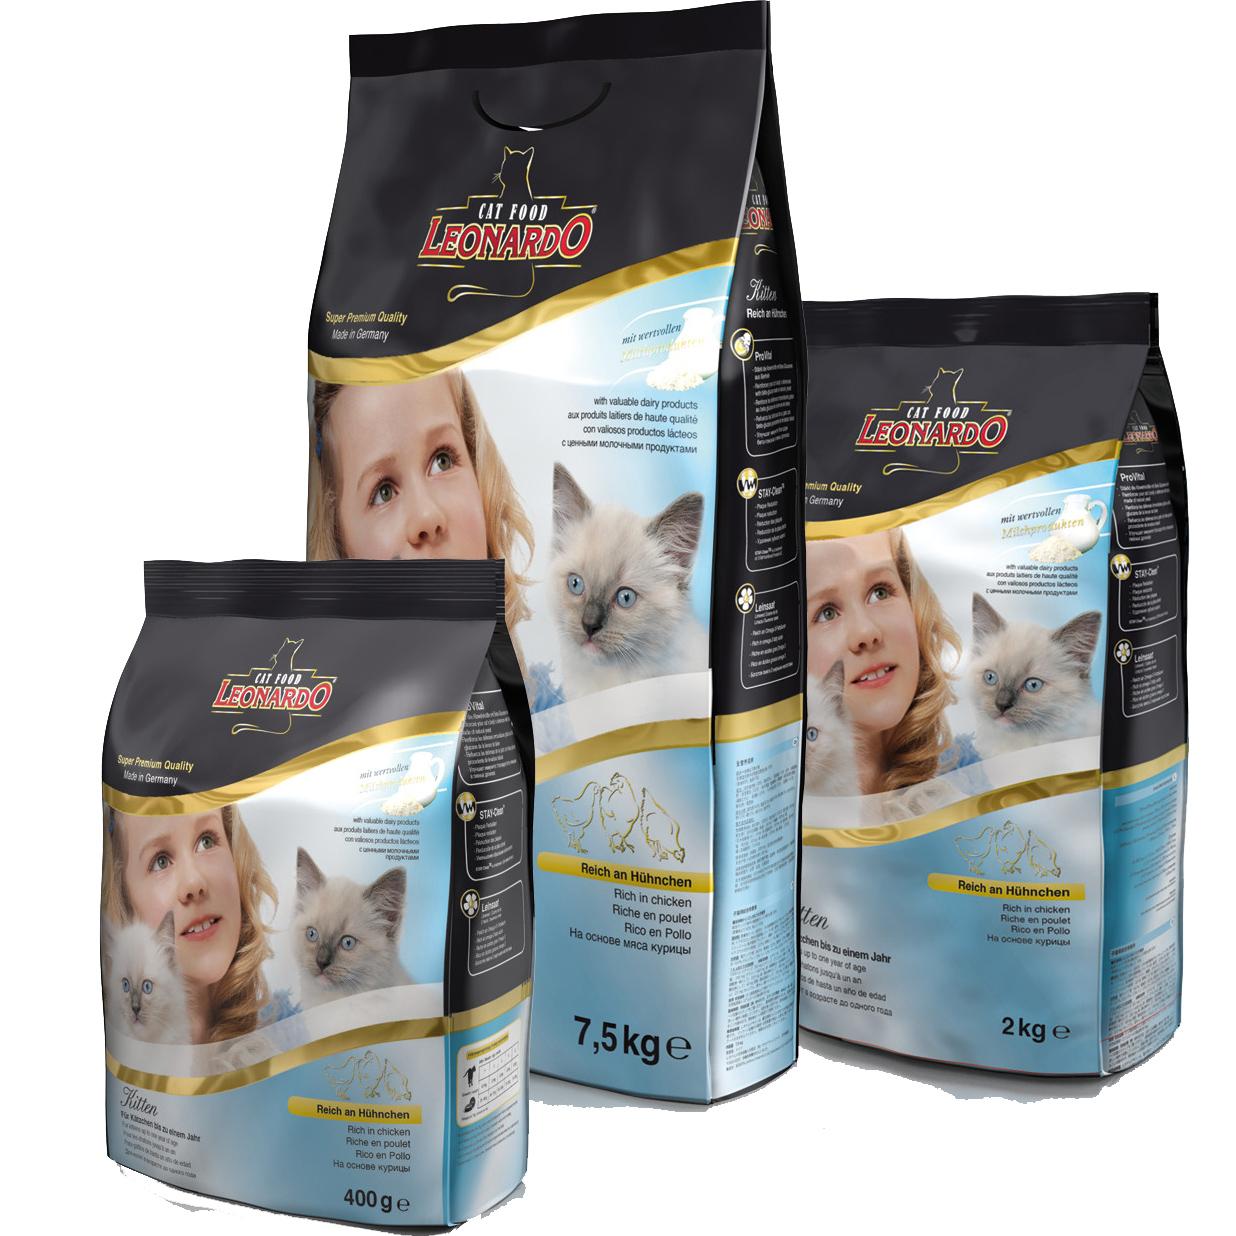 Leonardo pisica kitten pui 2 kg 62 68 ron petmart petshop for Clou arredi farmacie